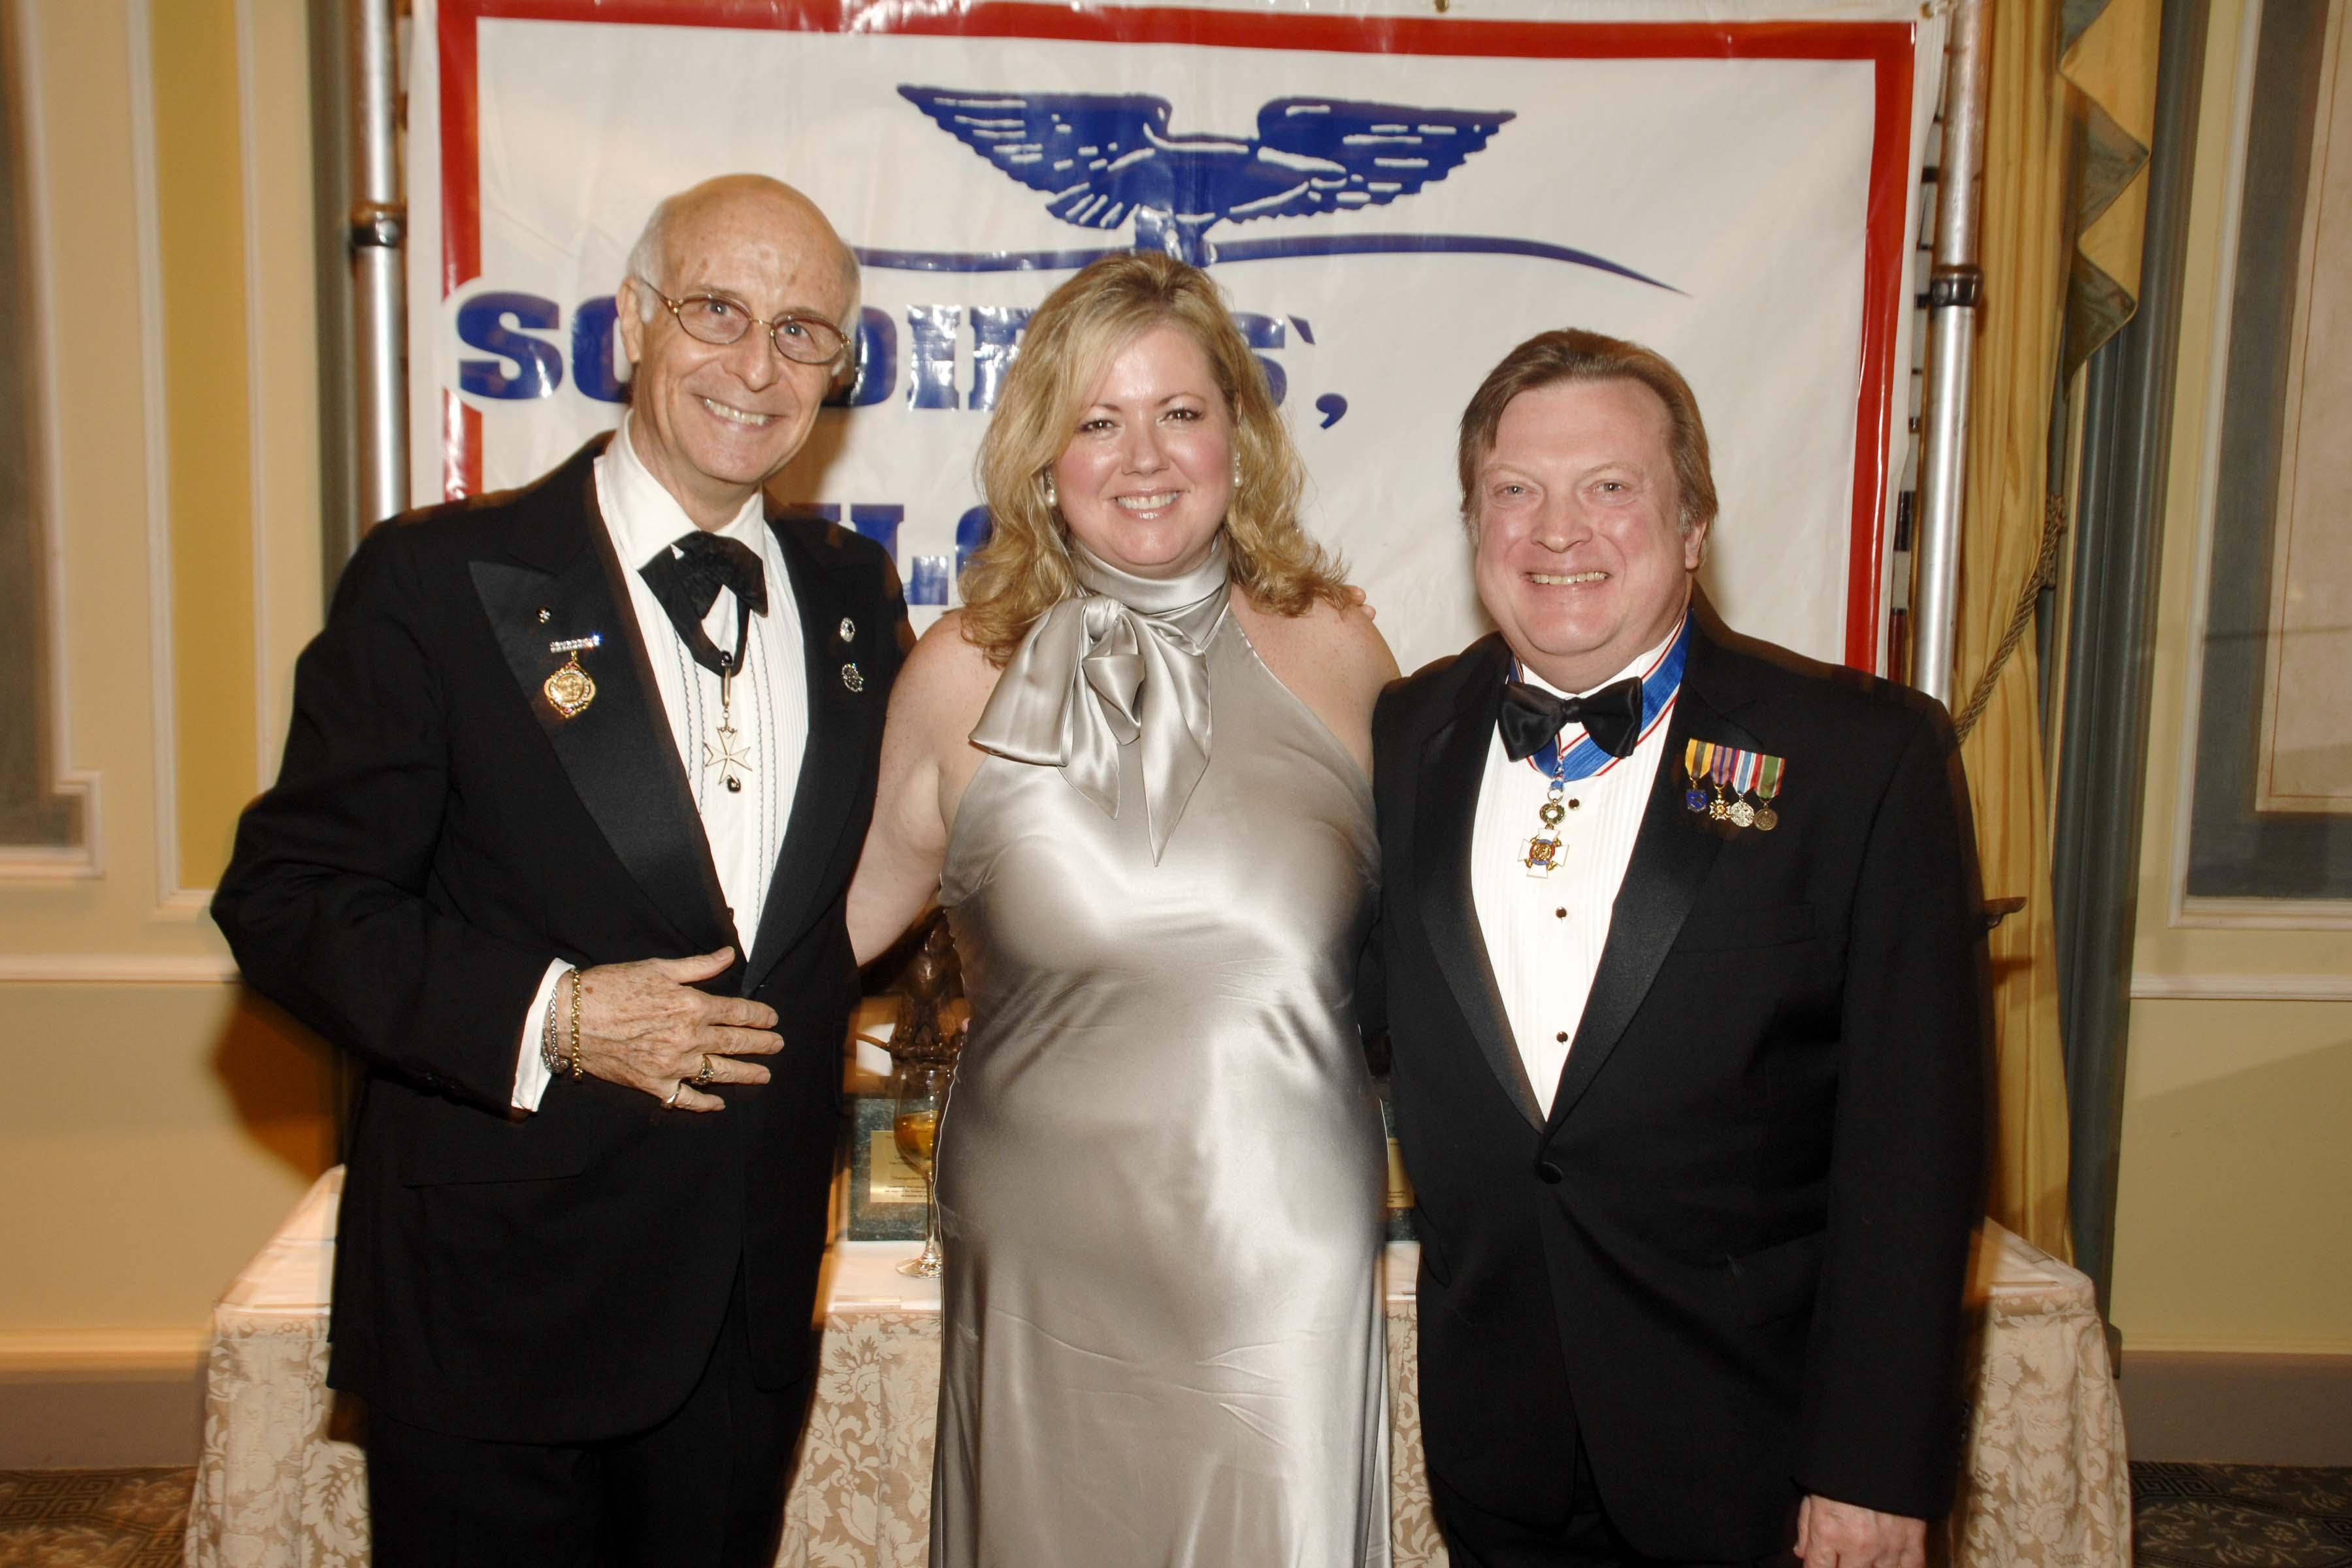 L to R Rick Perkins, Sherry Laue and Bruce Laue